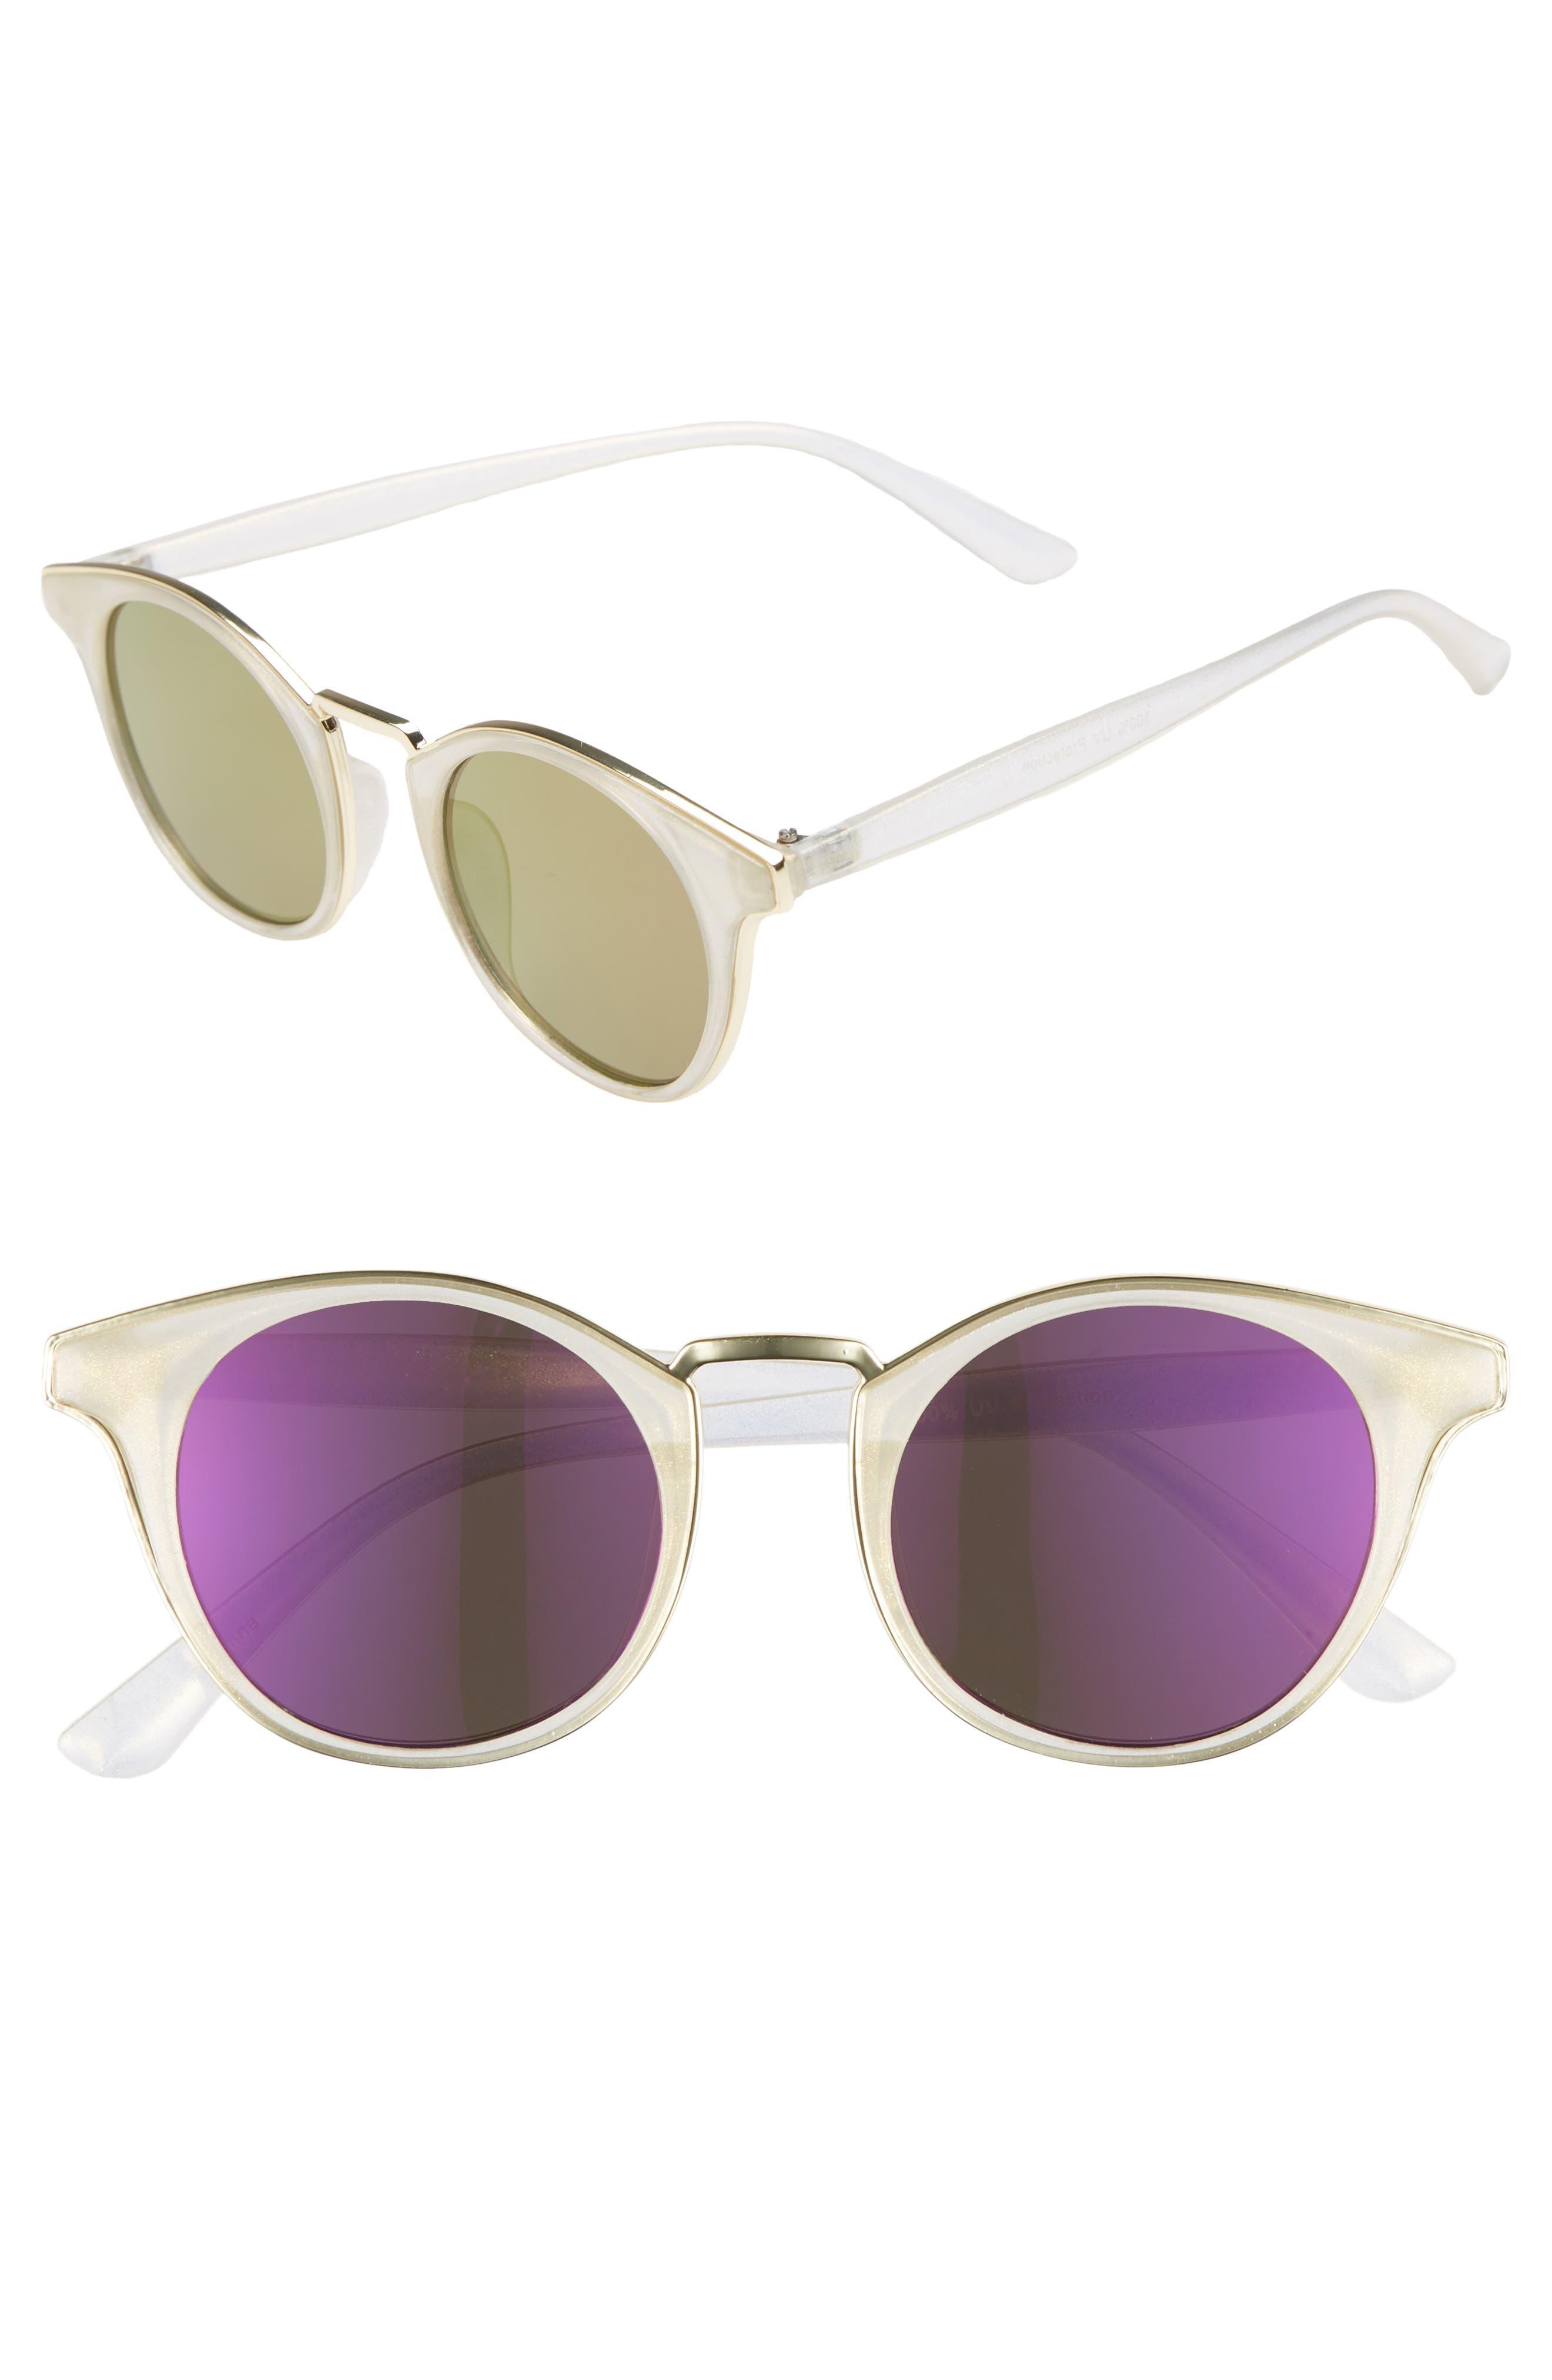 47mm Metal Trim Round Sunglasses,                         Main,                         color, Clear/ Blue